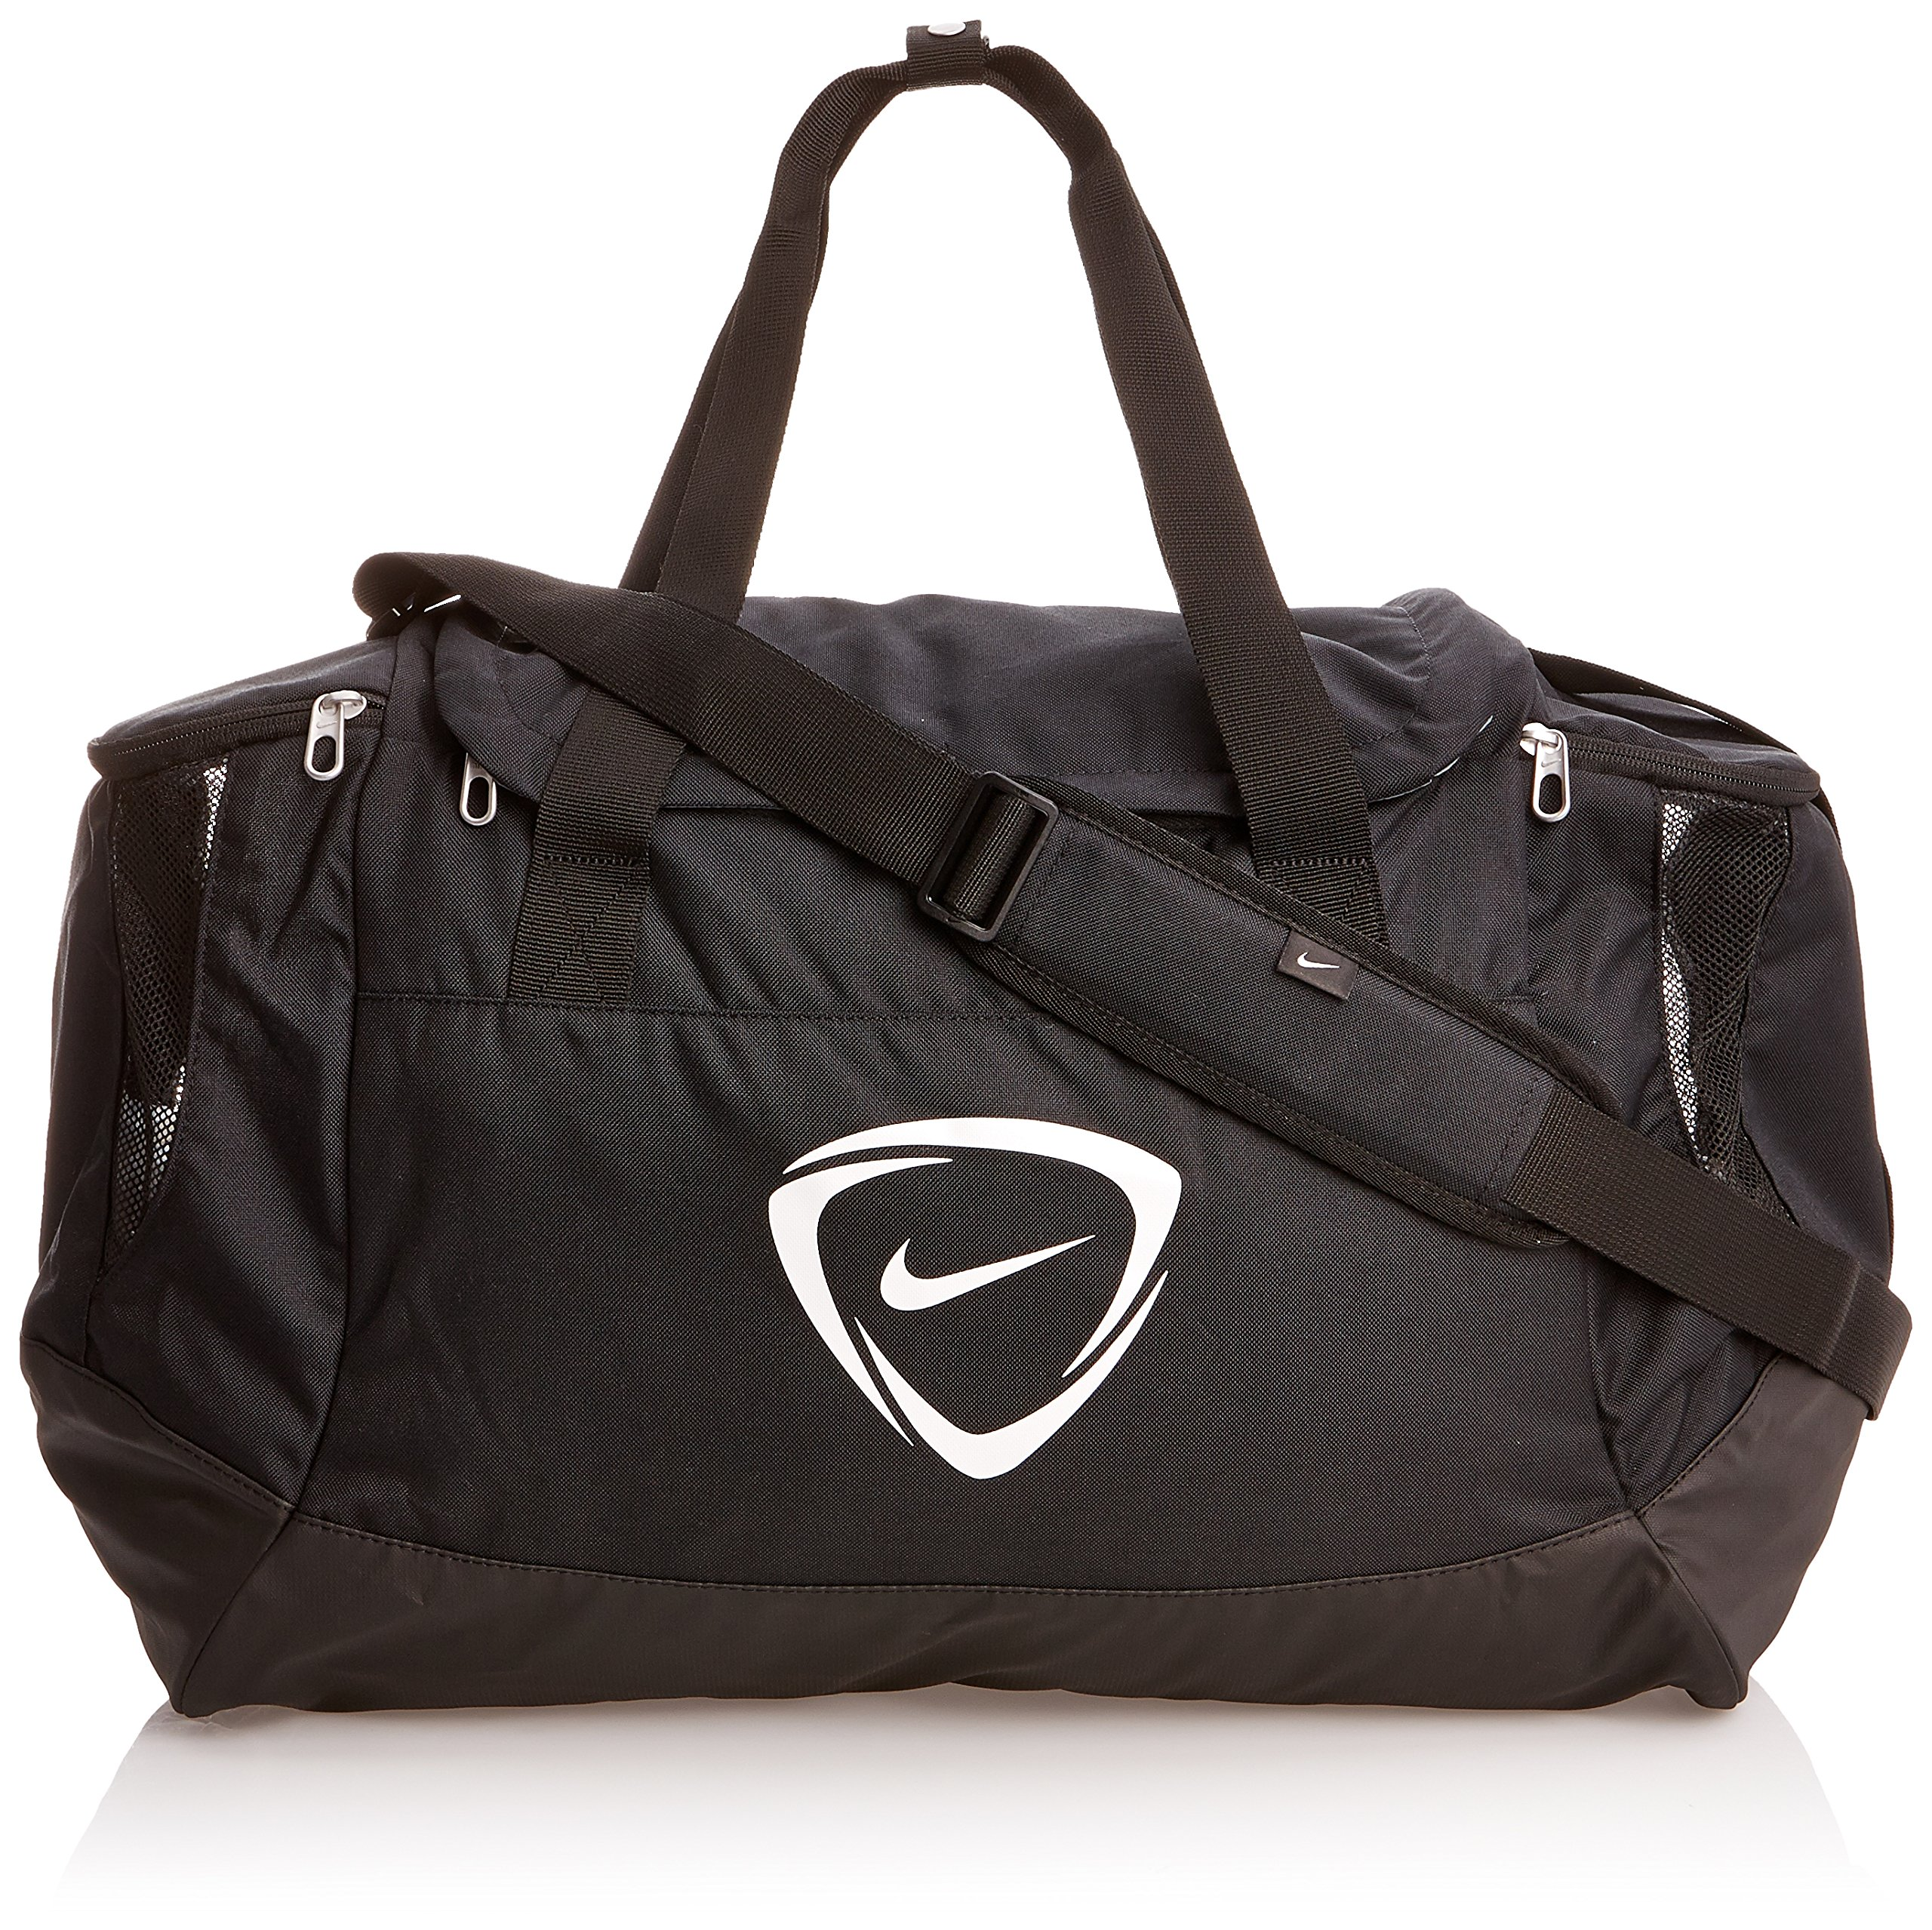 Nike Unisex Club Team Gym Medium Duffle Bag M/52Liters L21'' x H15'' x W11'' Black